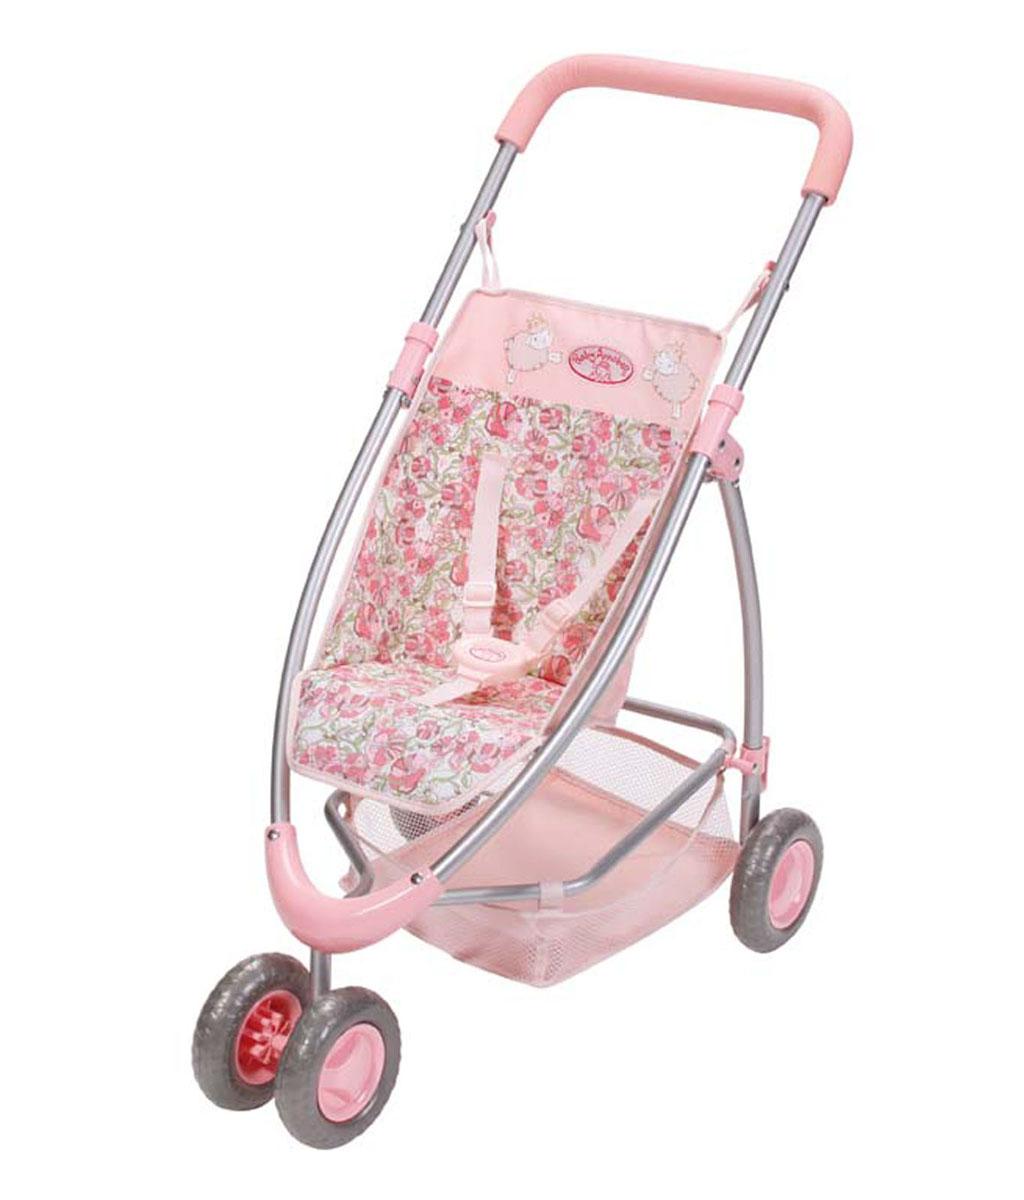 Купить Baby Annabell Коляска для куклы с сеткой цвет розовый, ZAPF Creation, Куклы и аксессуары